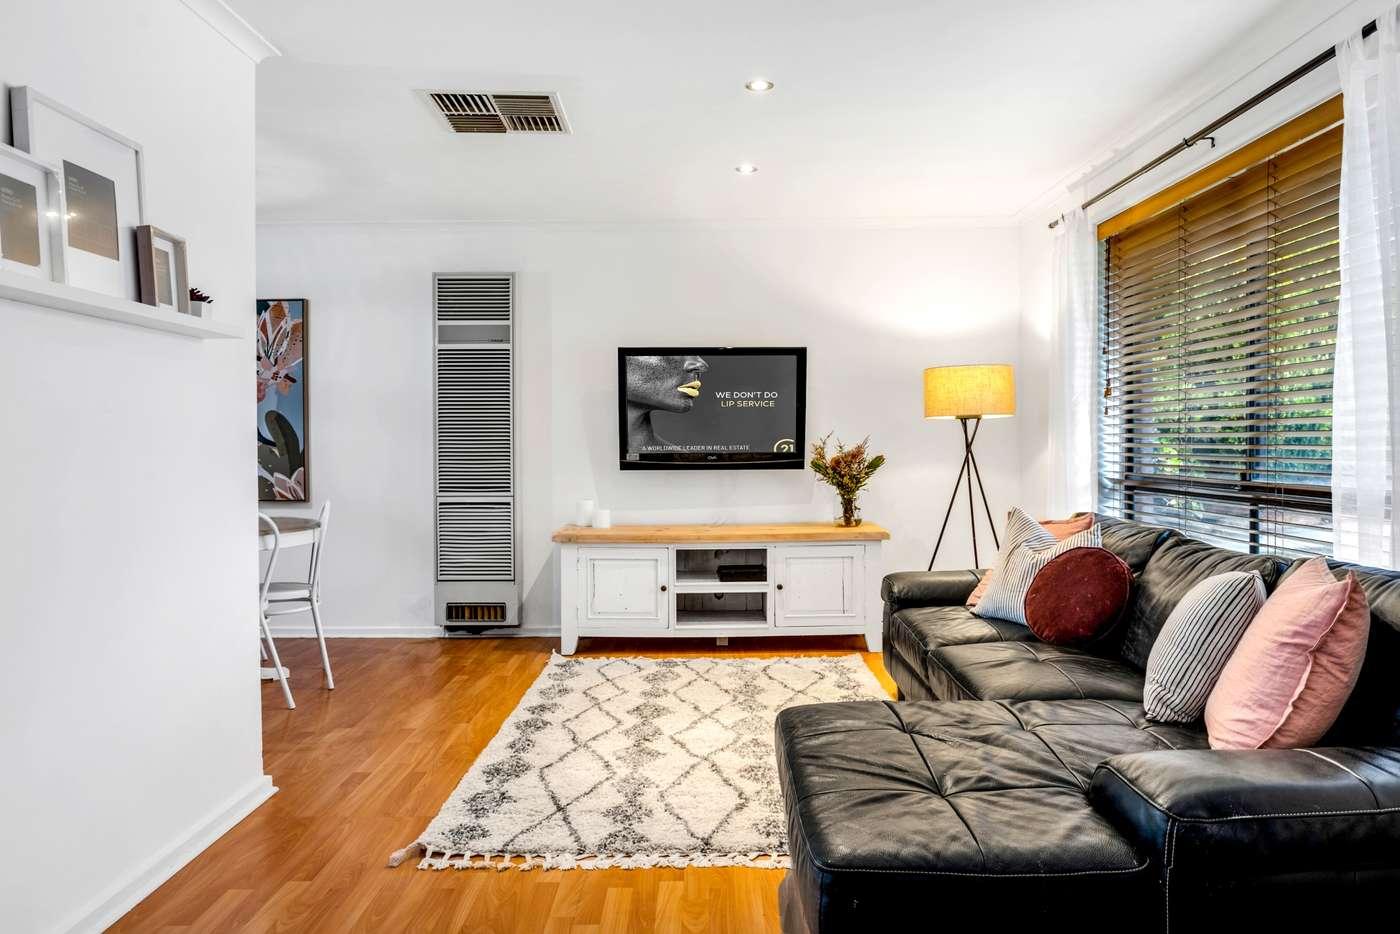 Fifth view of Homely house listing, 26 Kooyonga Way, Morphett Vale SA 5162